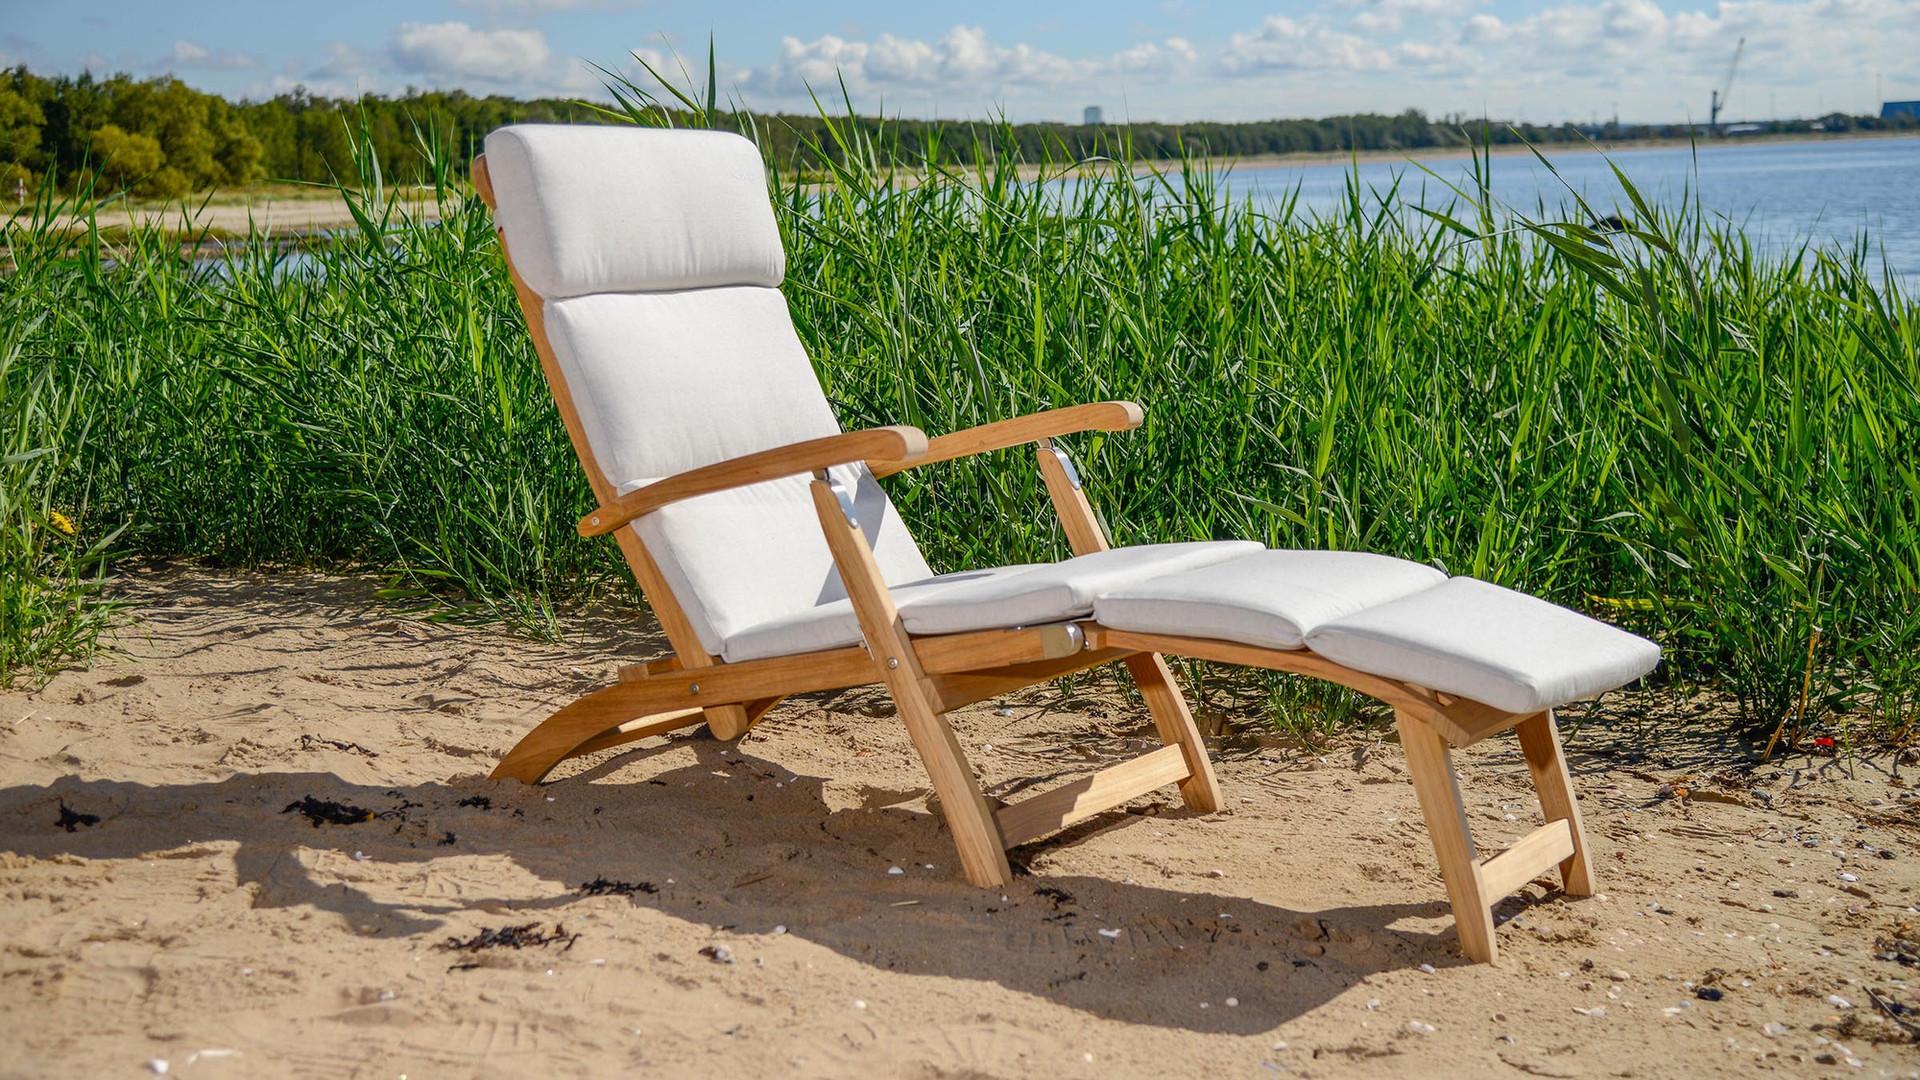 inout form deckchair